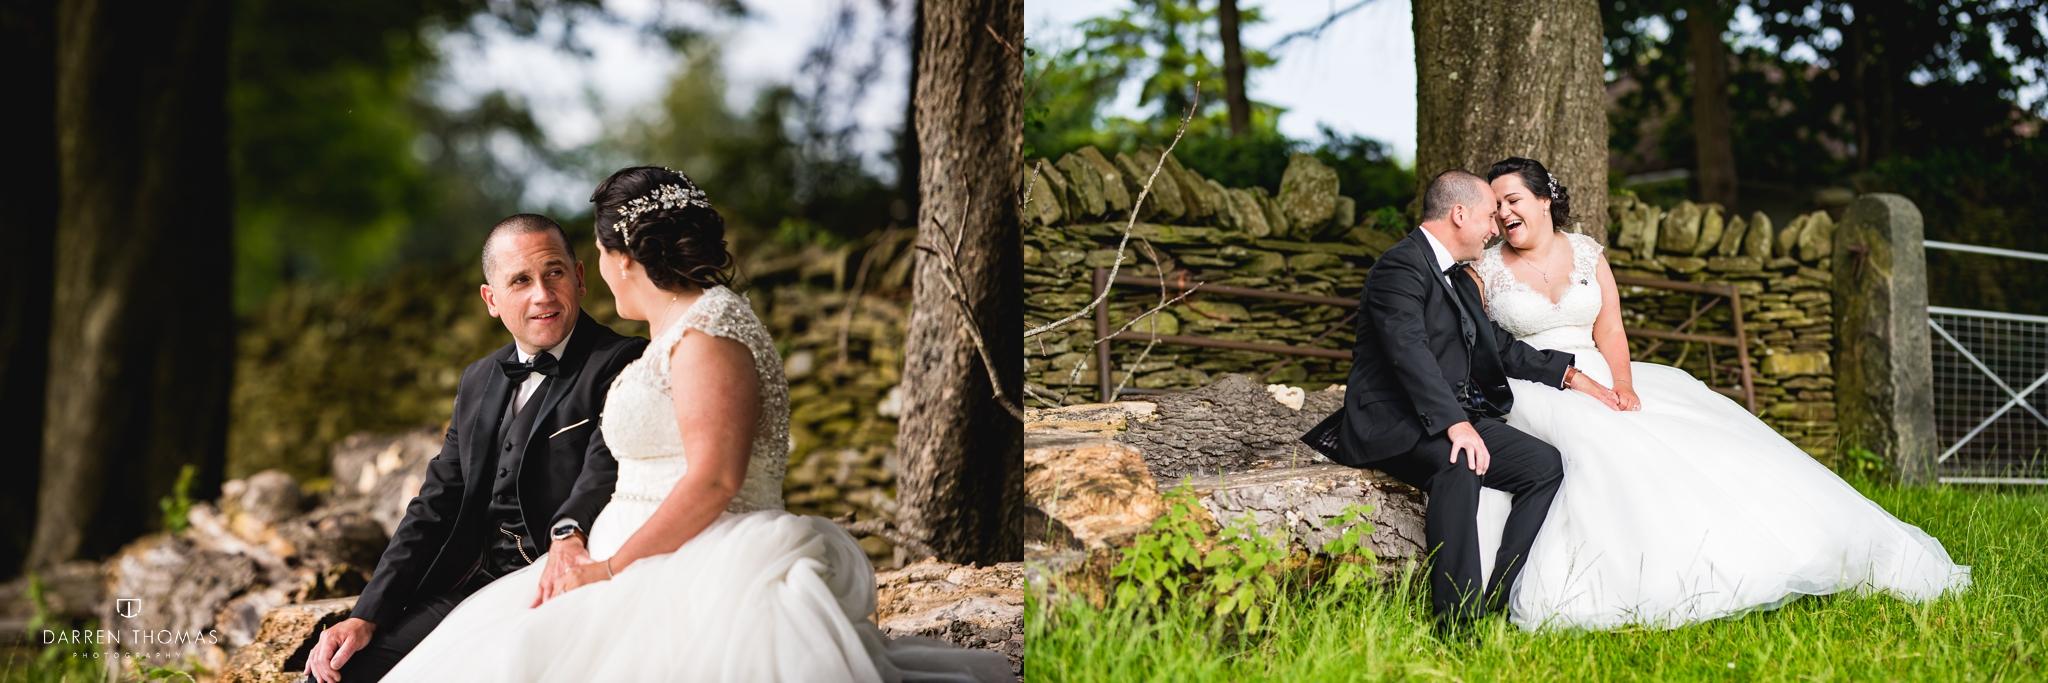 Llechwen-hall-wedding-photography19.jpg